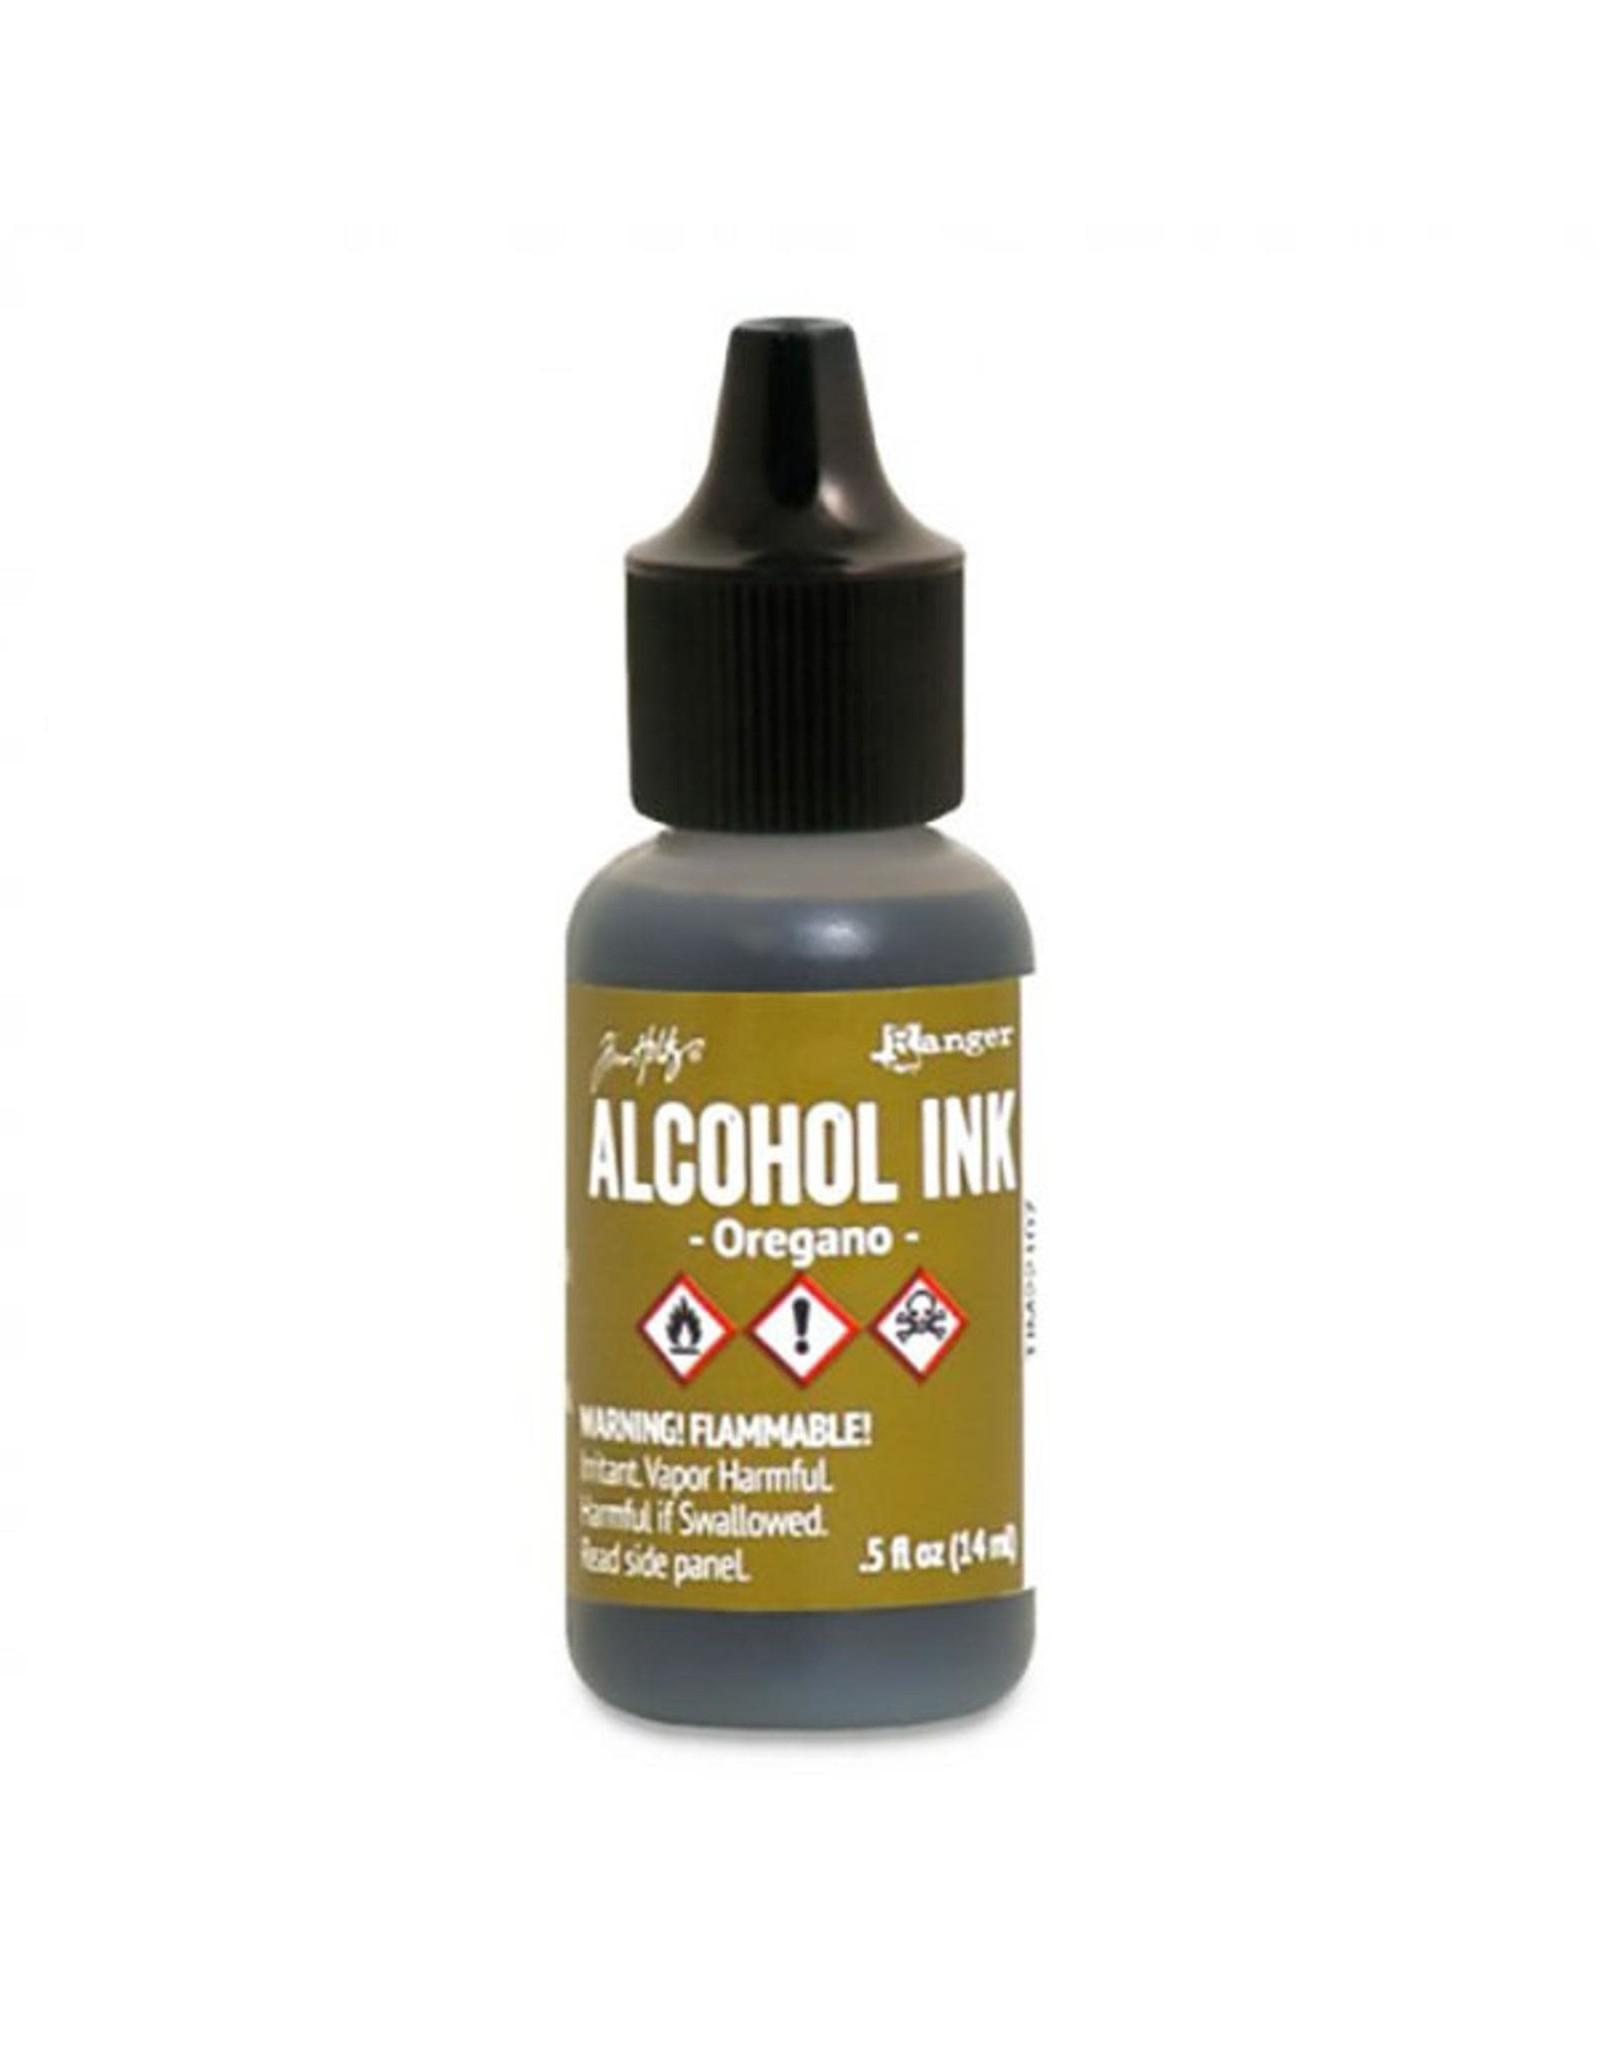 Tim Holtz Alcohol Ink 1/2 oz Oregano